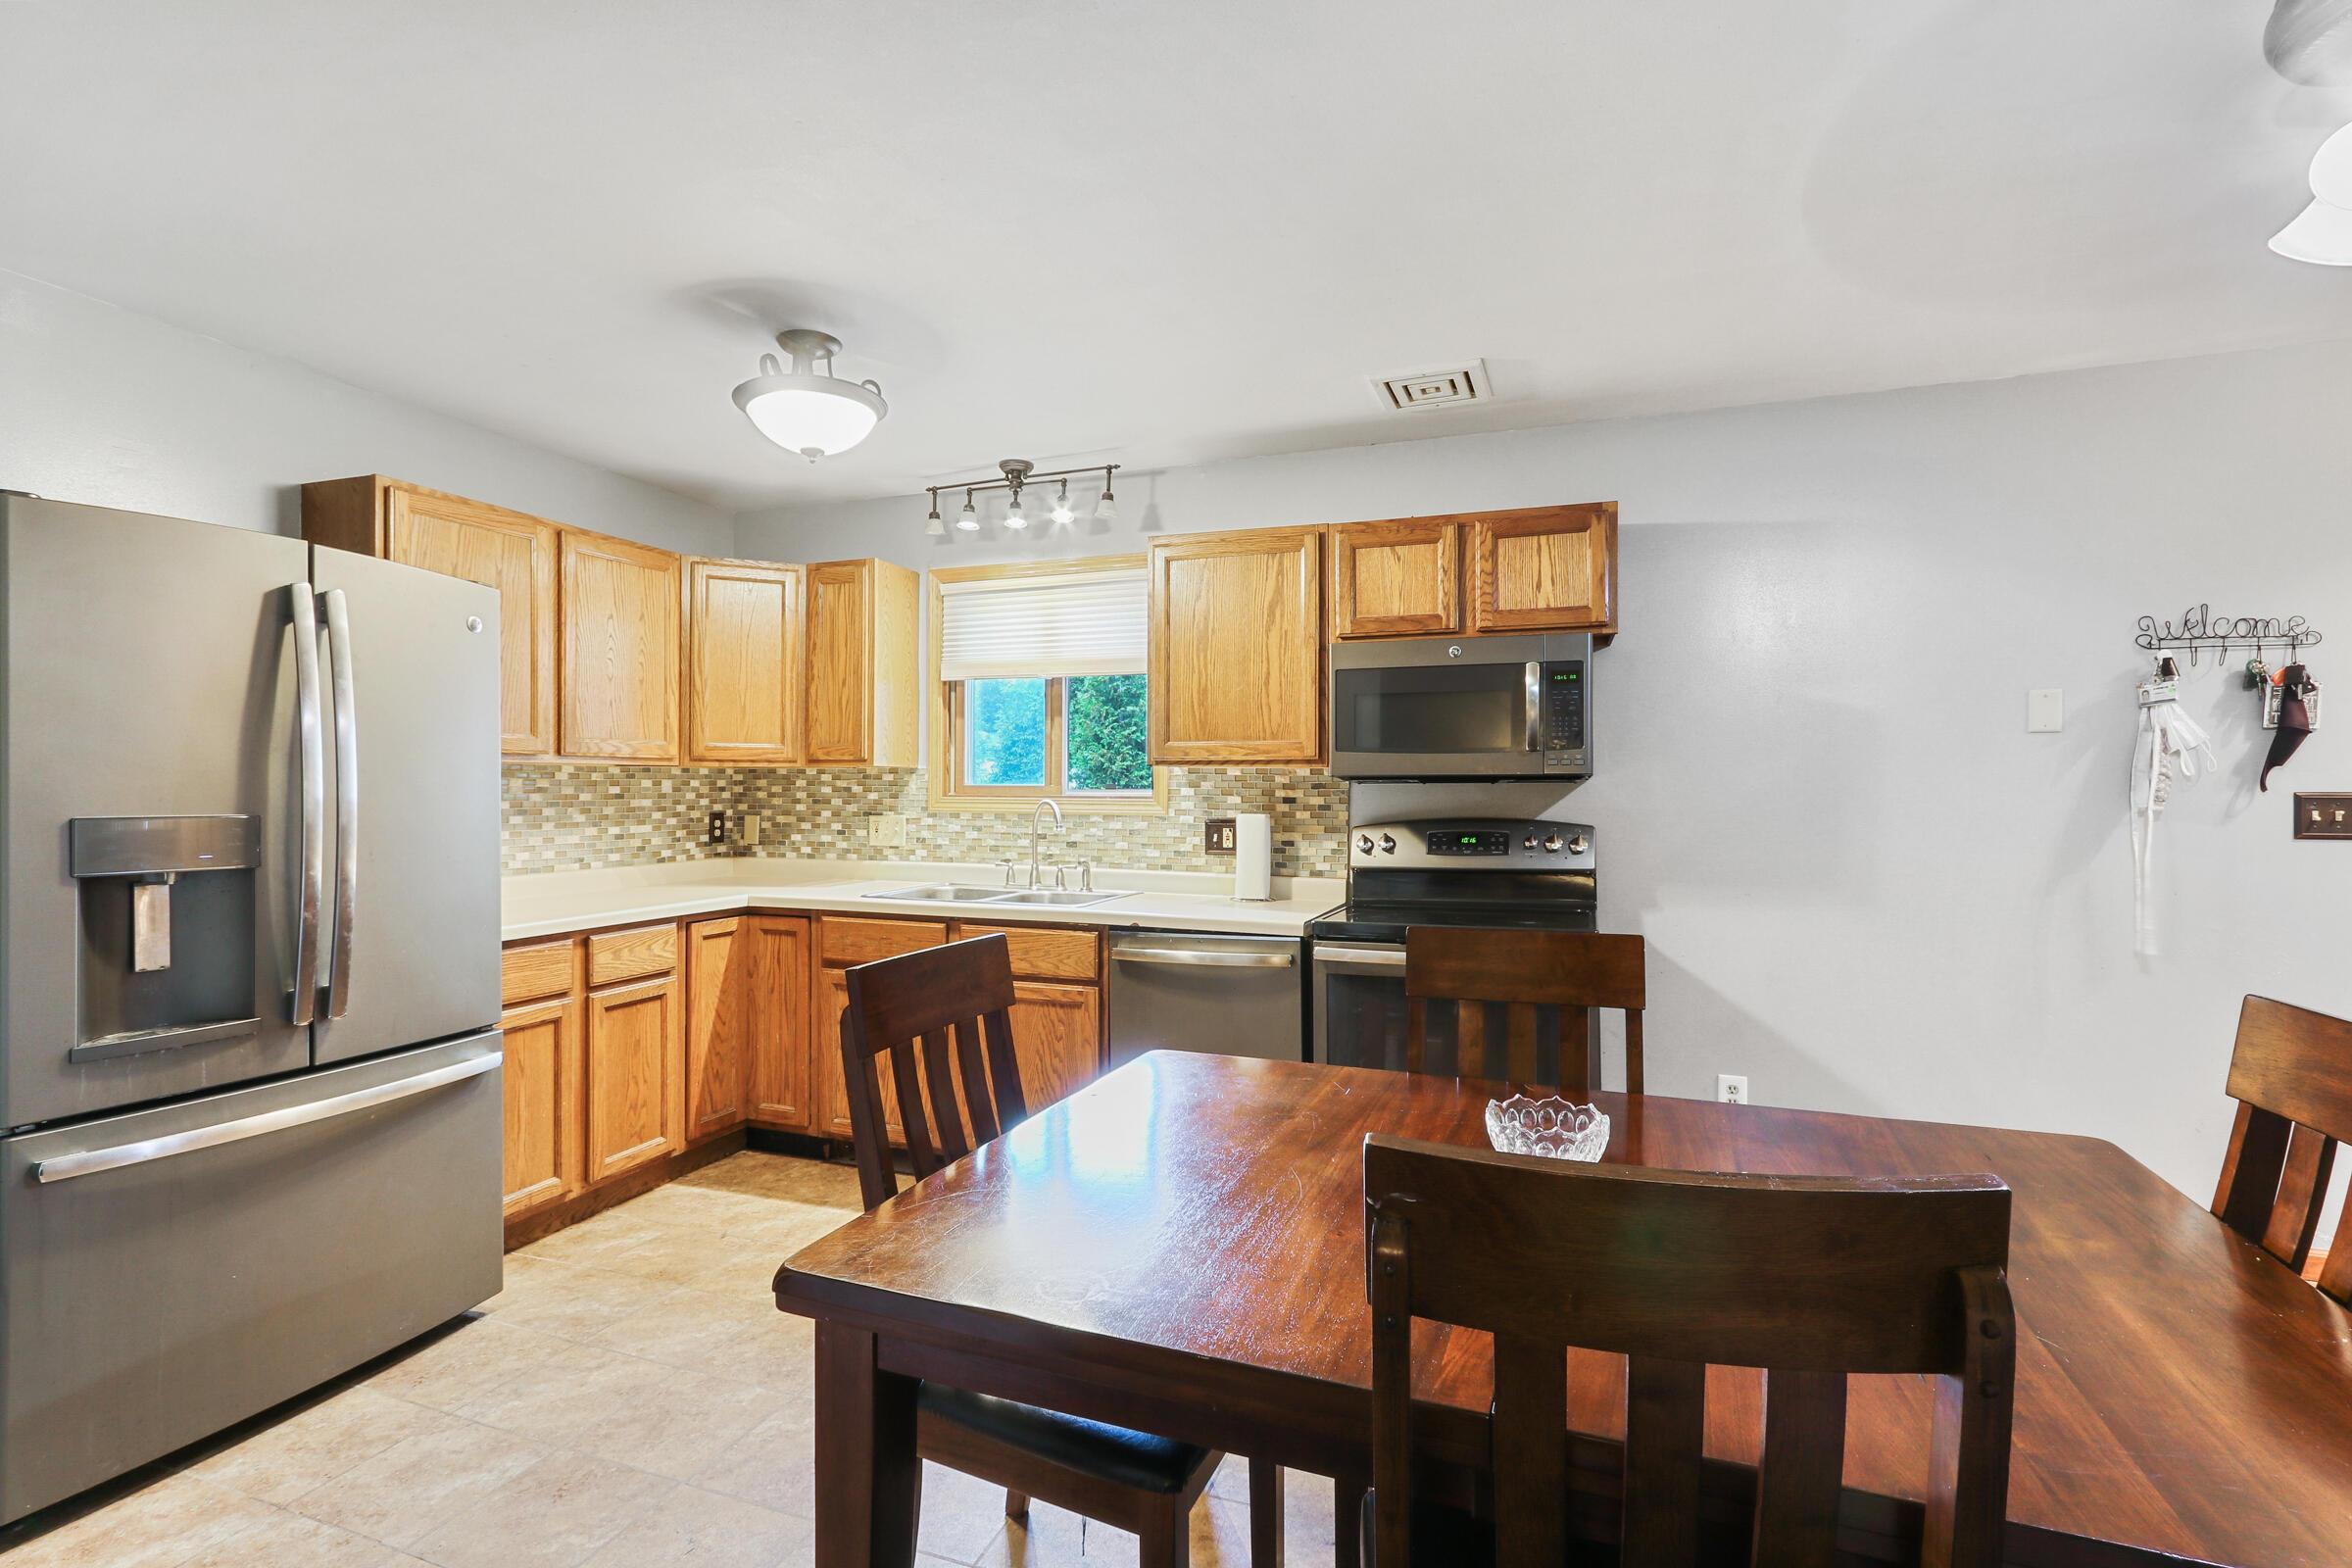 420 Amparo St, Elkhorn, Wisconsin 53121, 3 Bedrooms Bedrooms, ,2 BathroomsBathrooms,Single-Family,For Sale,Amparo St,1768283